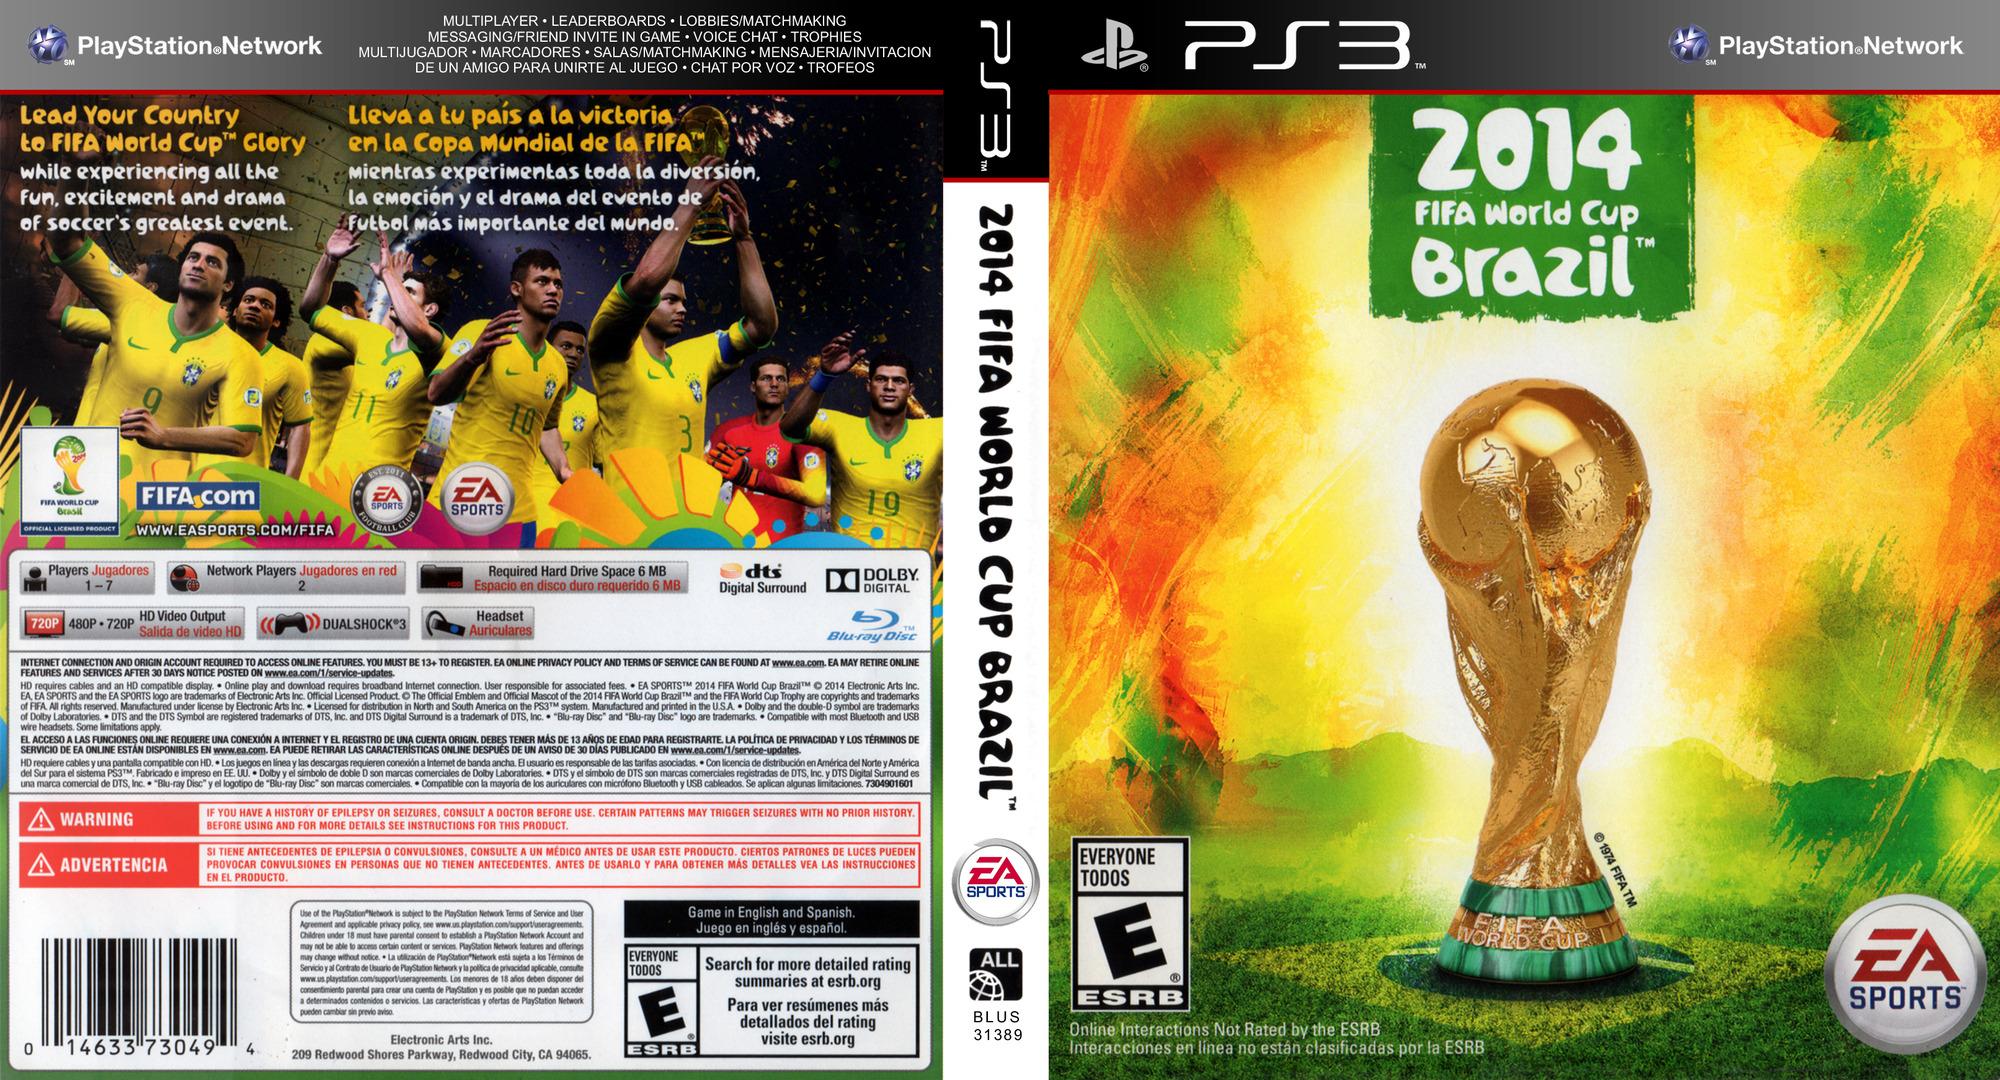 2014 FIFA World Cup Brazil PS3 coverfullHQ (BLUS31389)